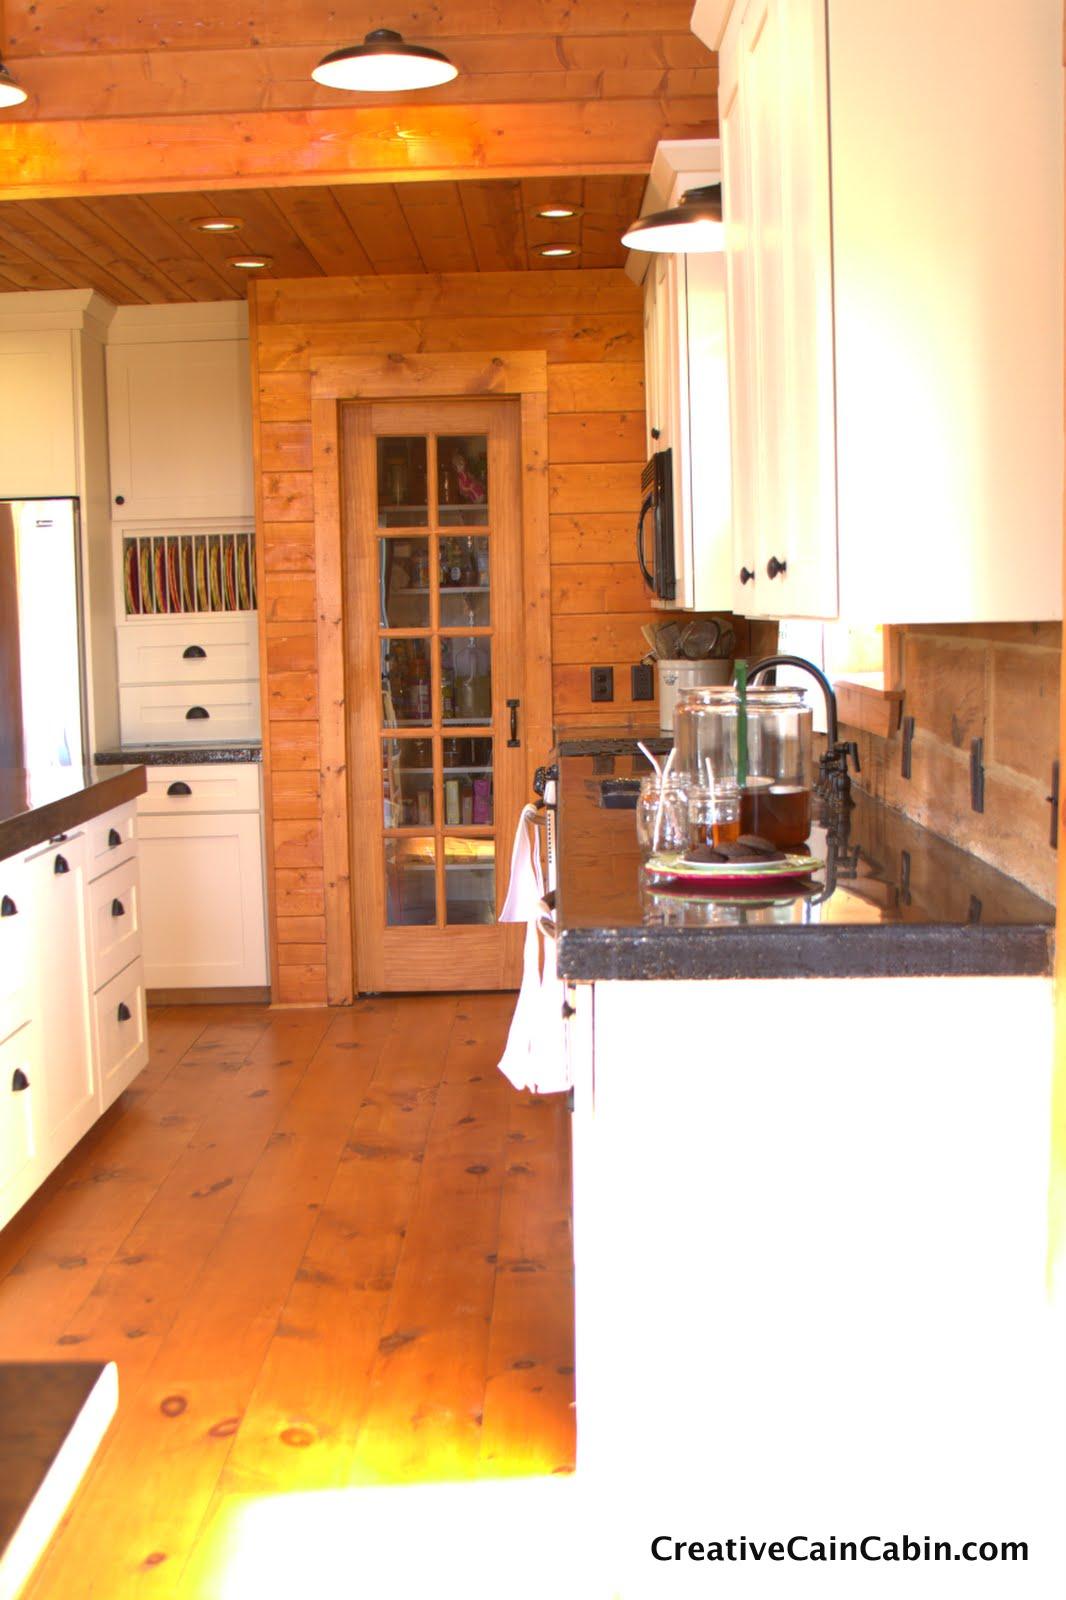 The enchanting Beadboard kitchen backsplash style digital photography